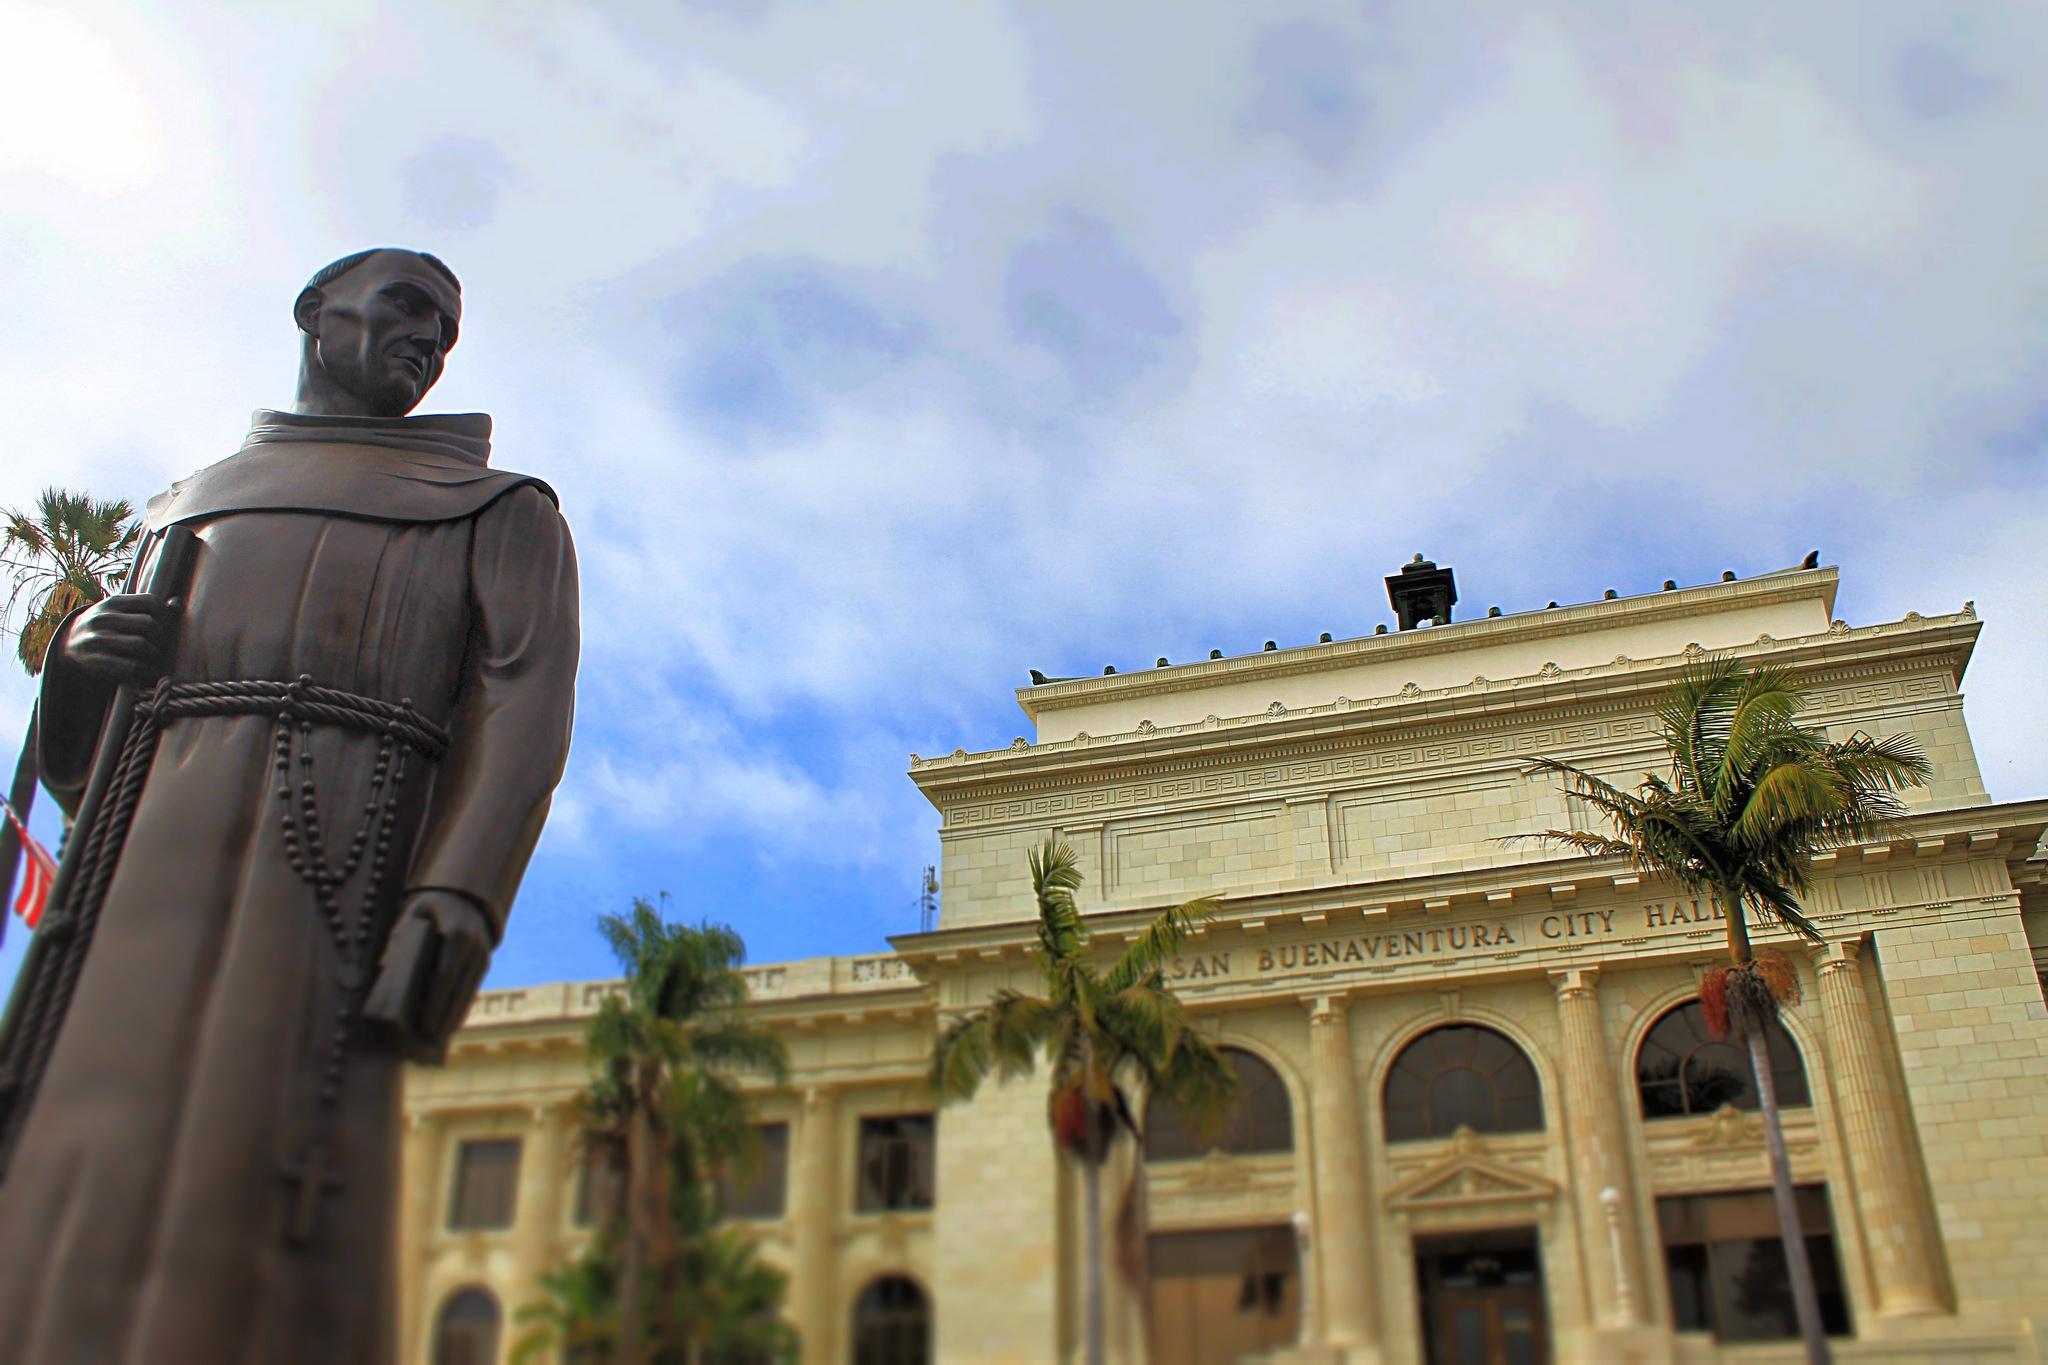 Saint Junipero Serra: Missionary of California